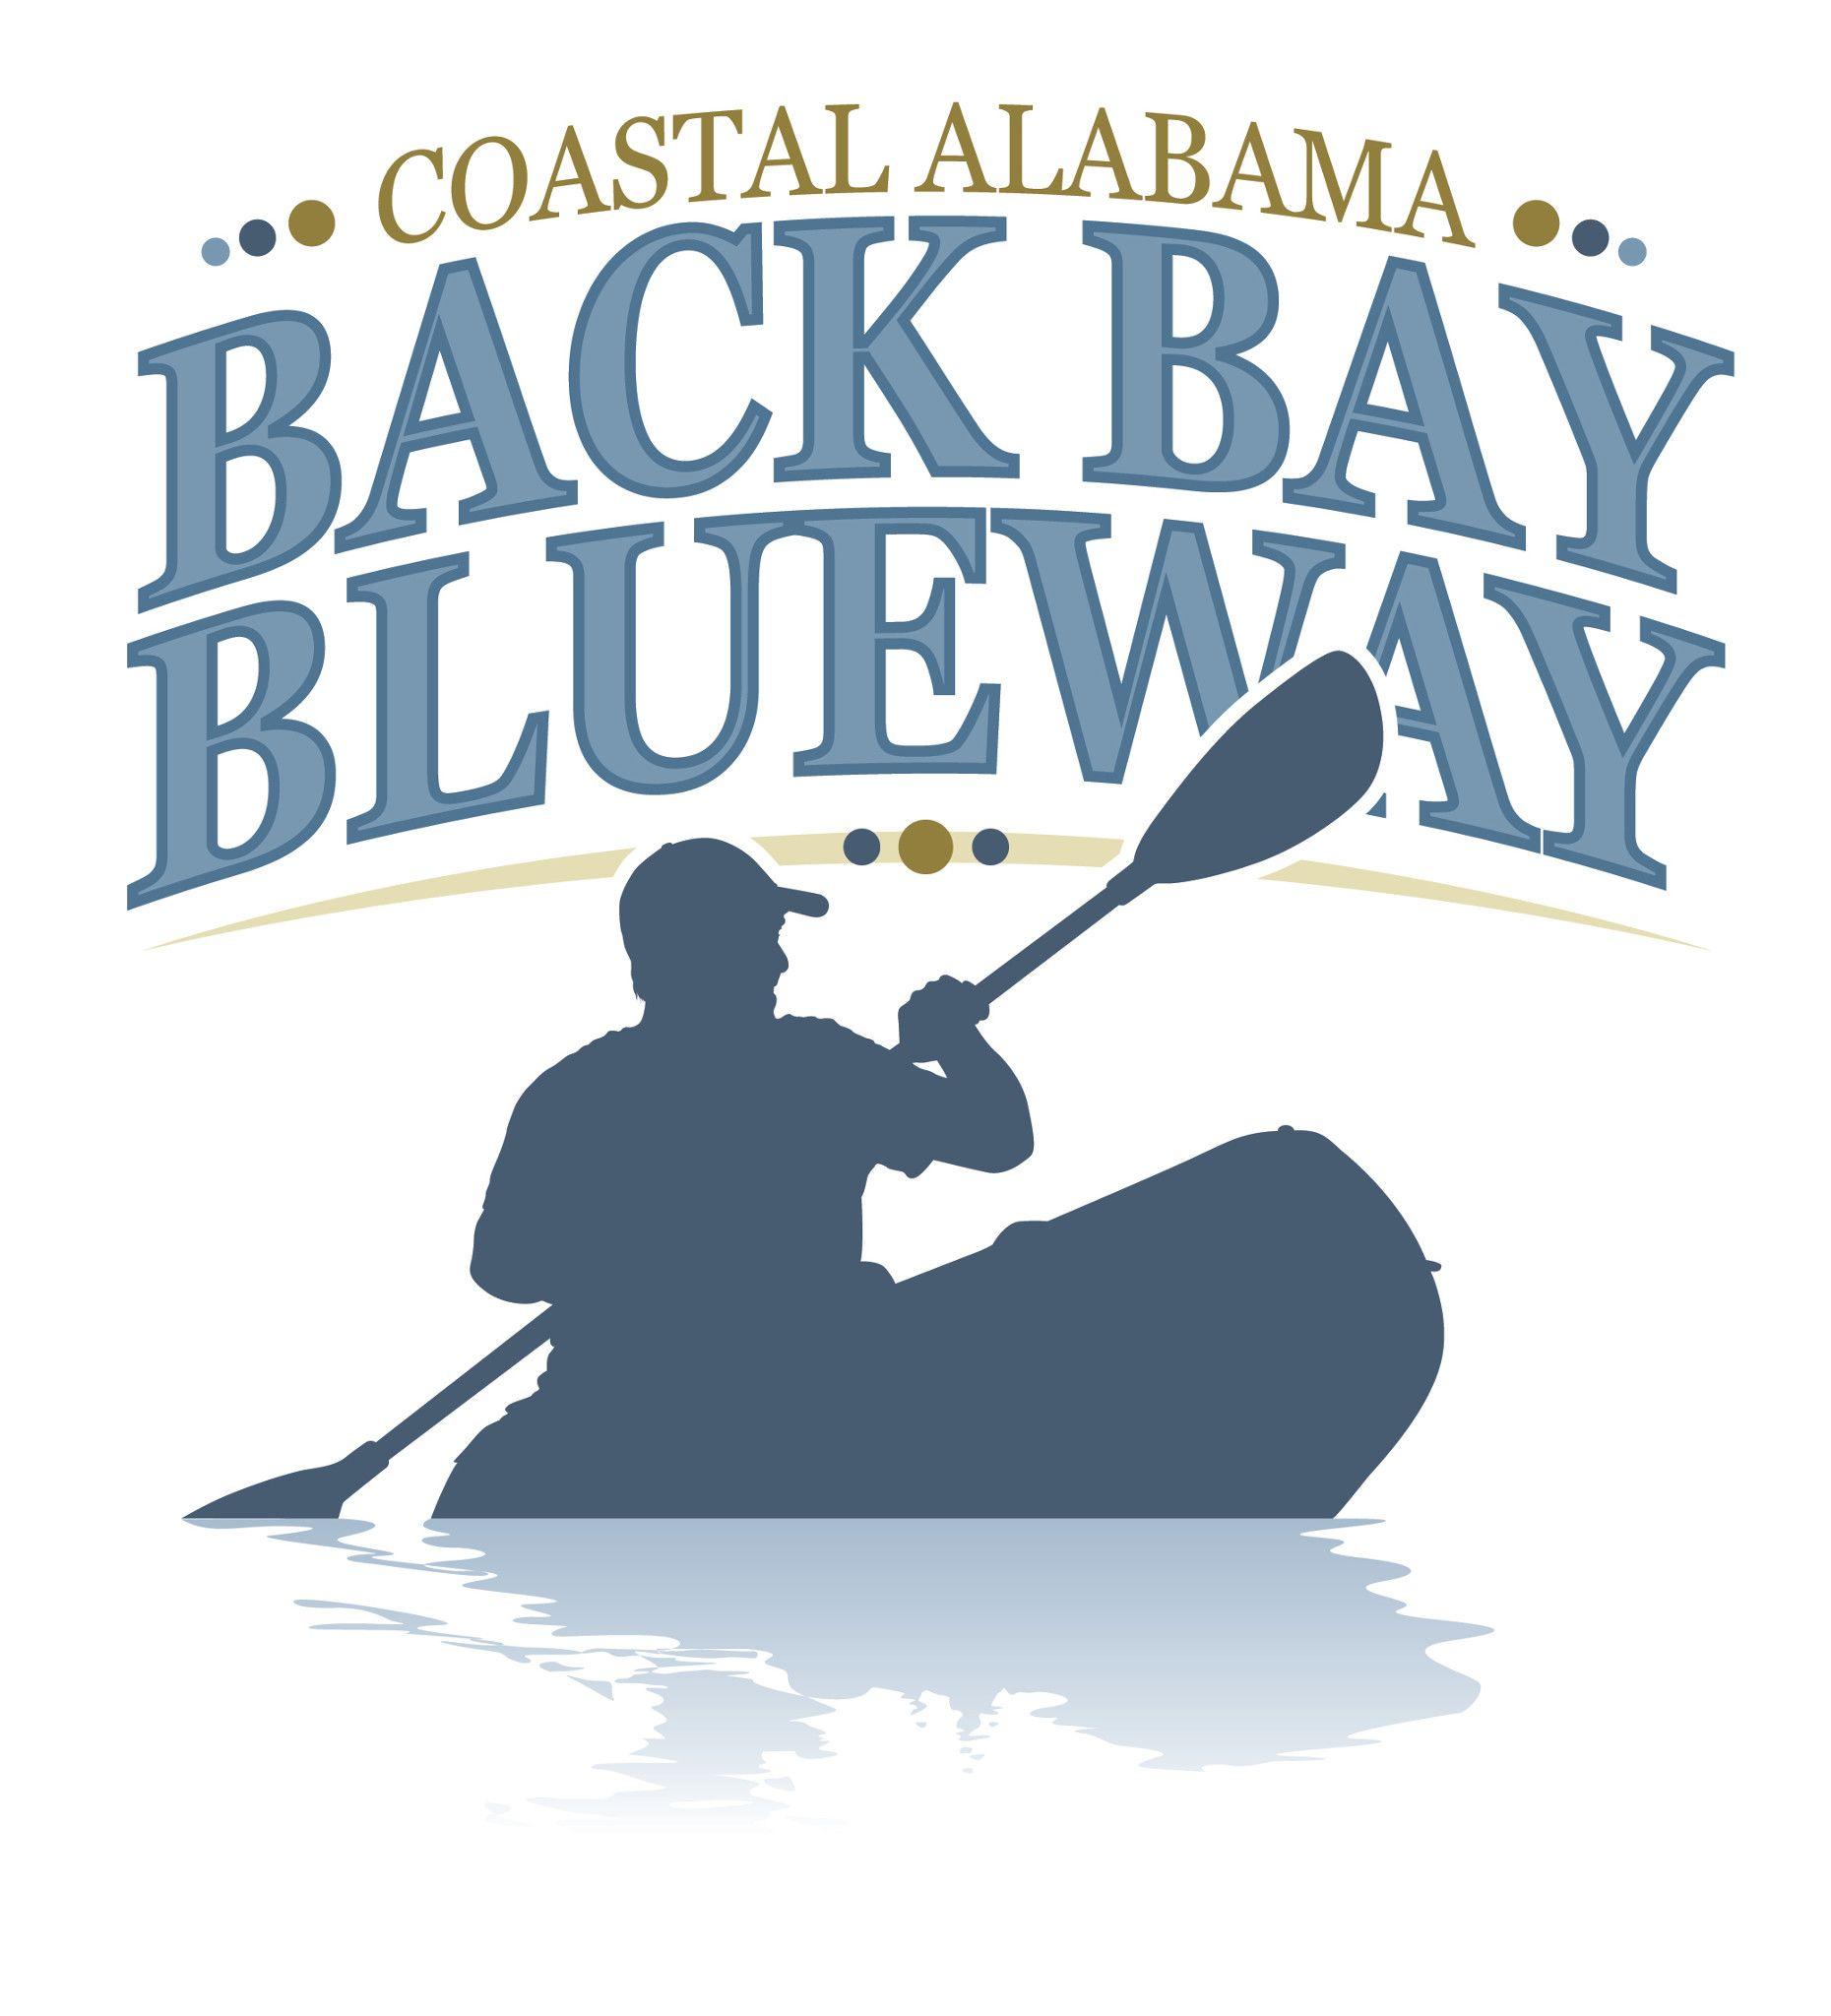 Back Bay Blueway logo